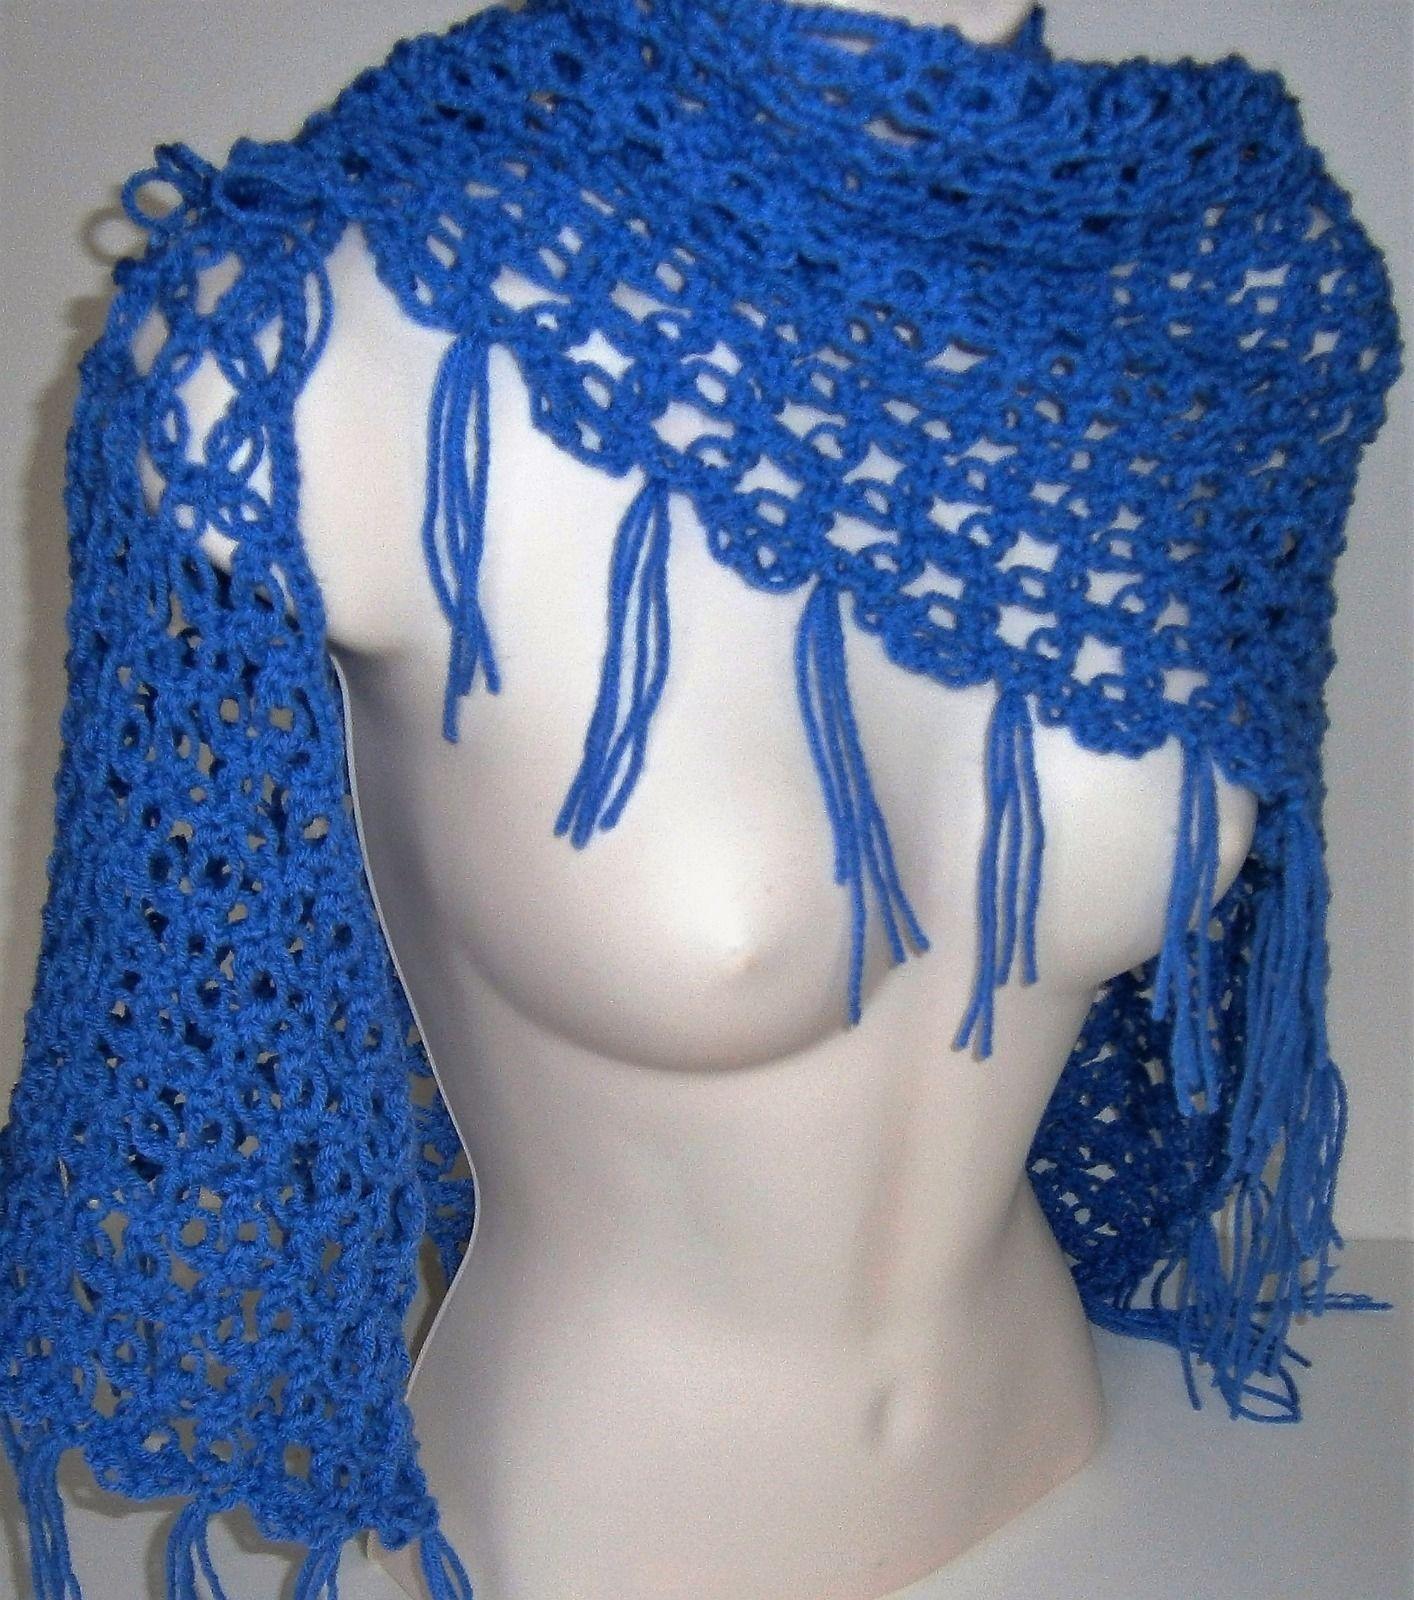 Blue Hydrangea Fantasy Shawl  Handmade Crochet Knit Wrap Scarf Stole Poncho